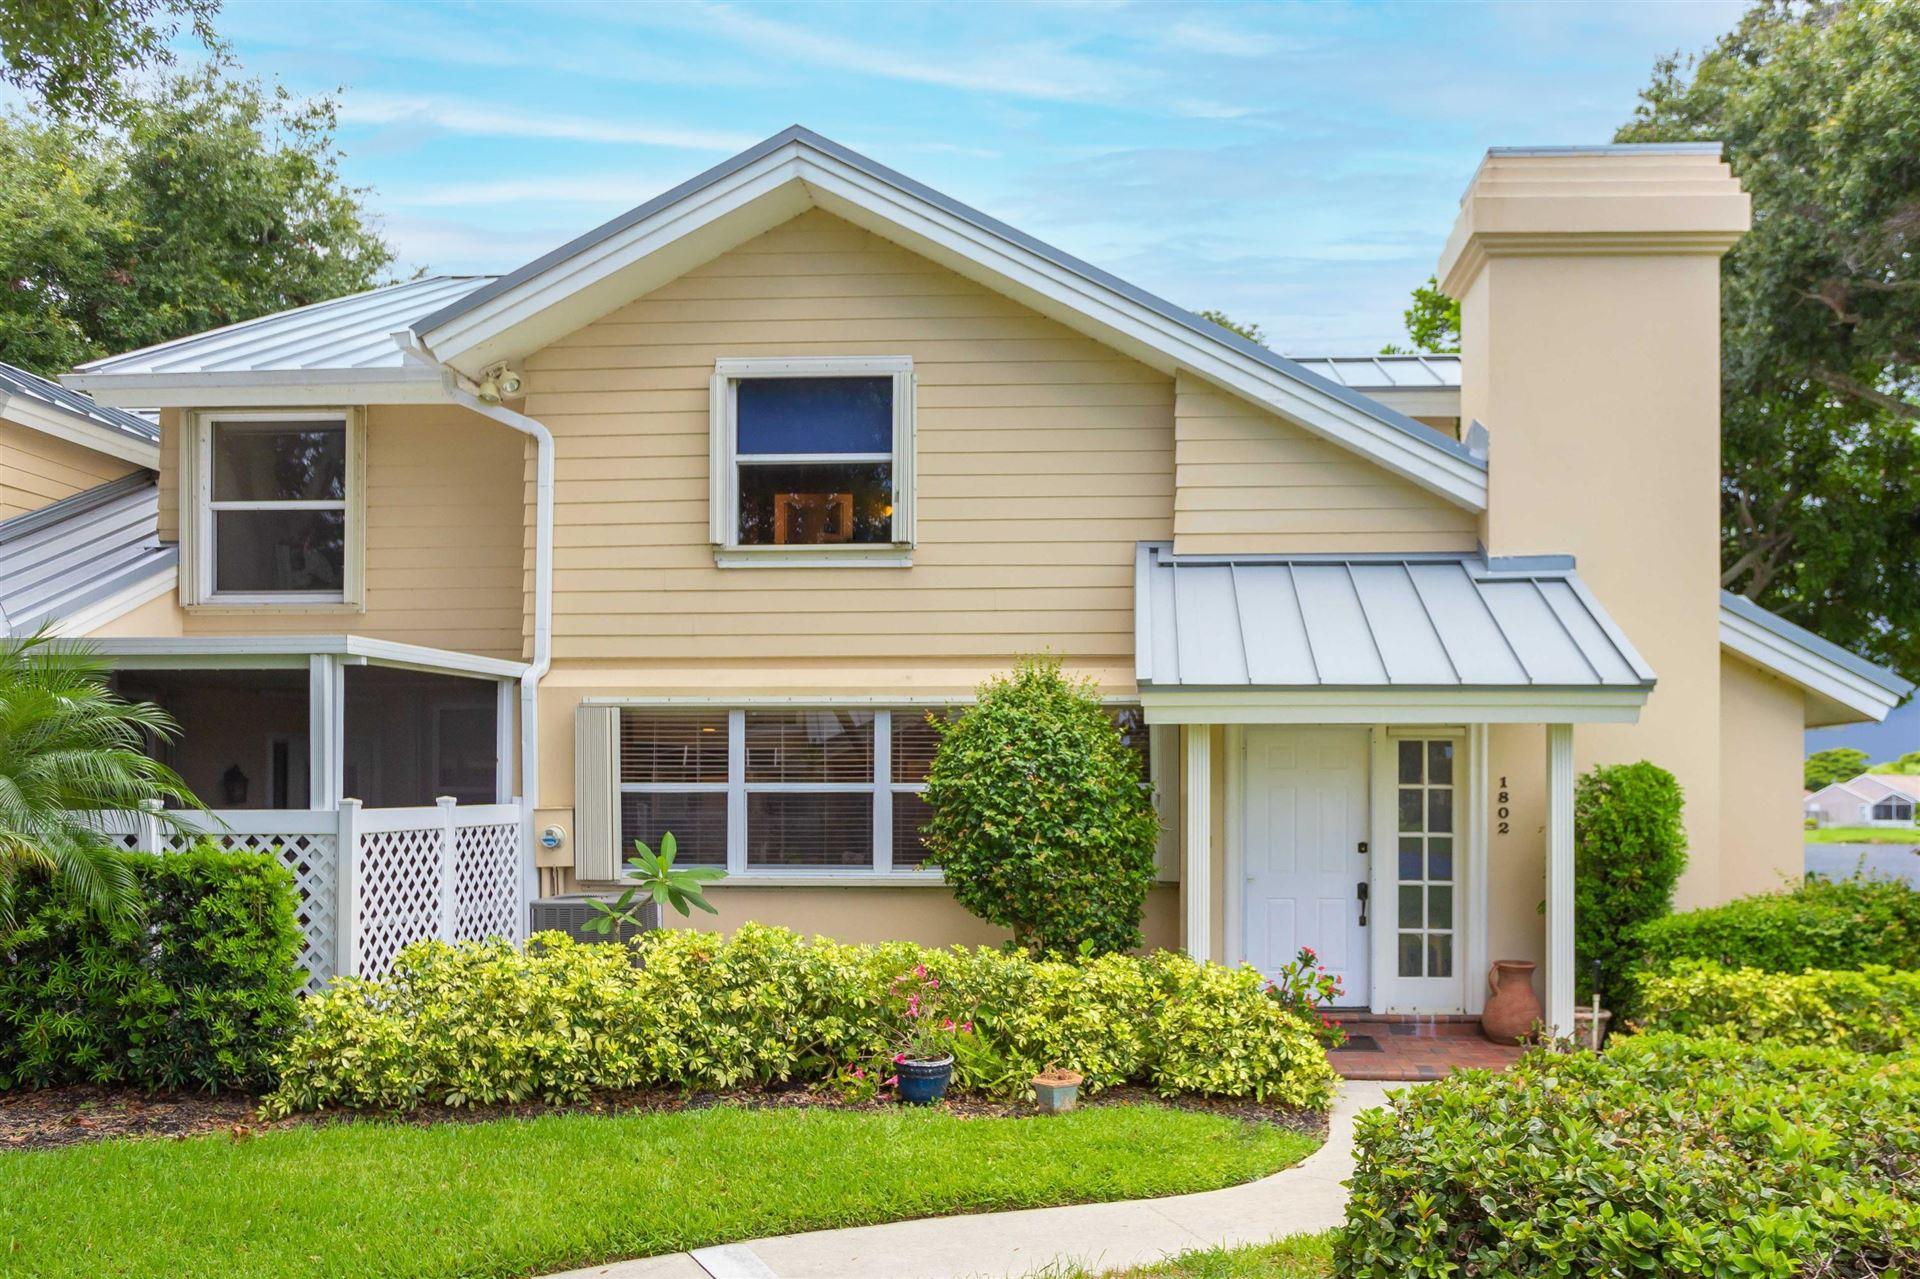 1802 Chadwick Court, Boynton Beach, FL 33436 - MLS#: RX-10731513